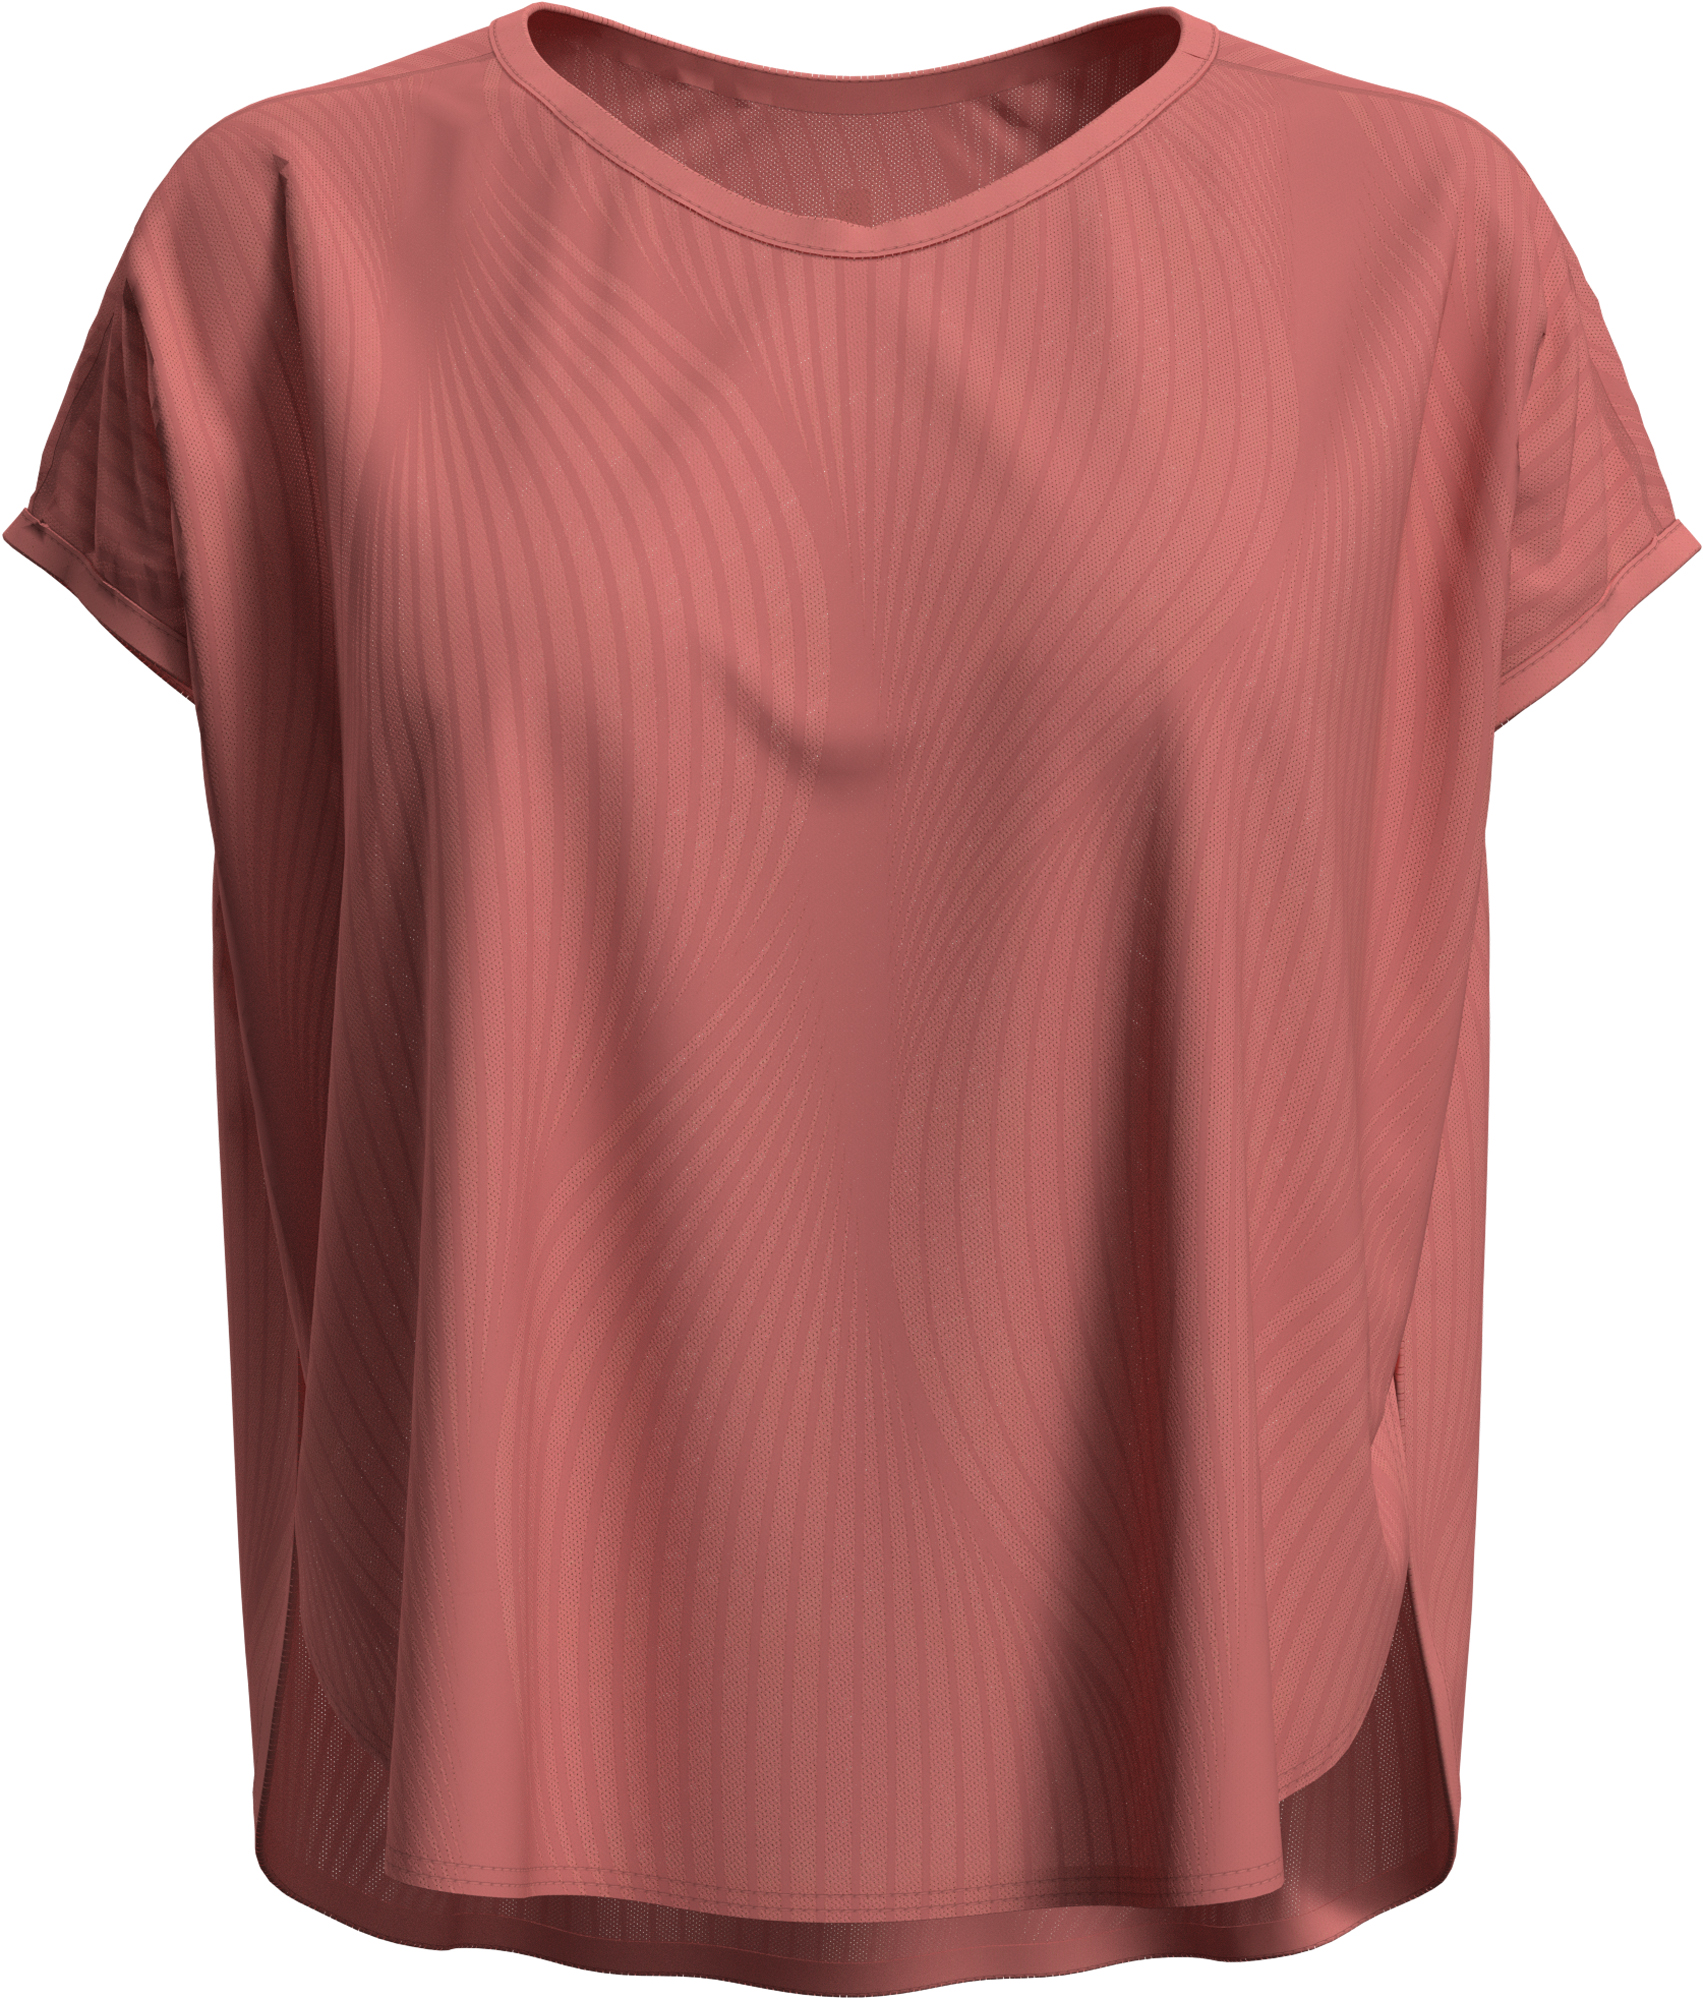 Odlo Футболка женская Odlo Maha, размер 44-46 odlo футболка женская odlo millennium размер 46 48